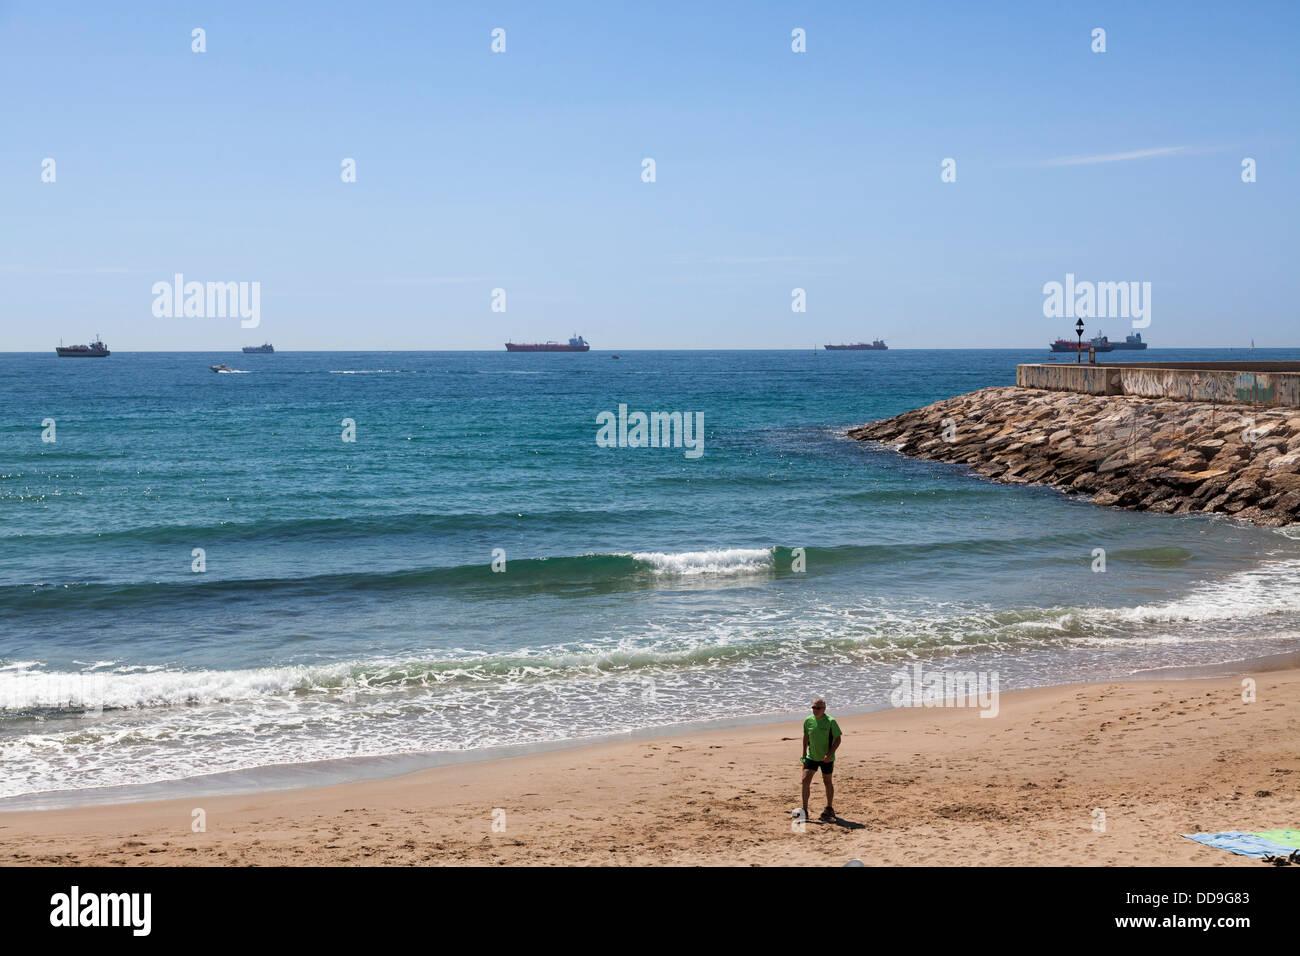 Tarragona beach with shipplin on horizon - Stock Image